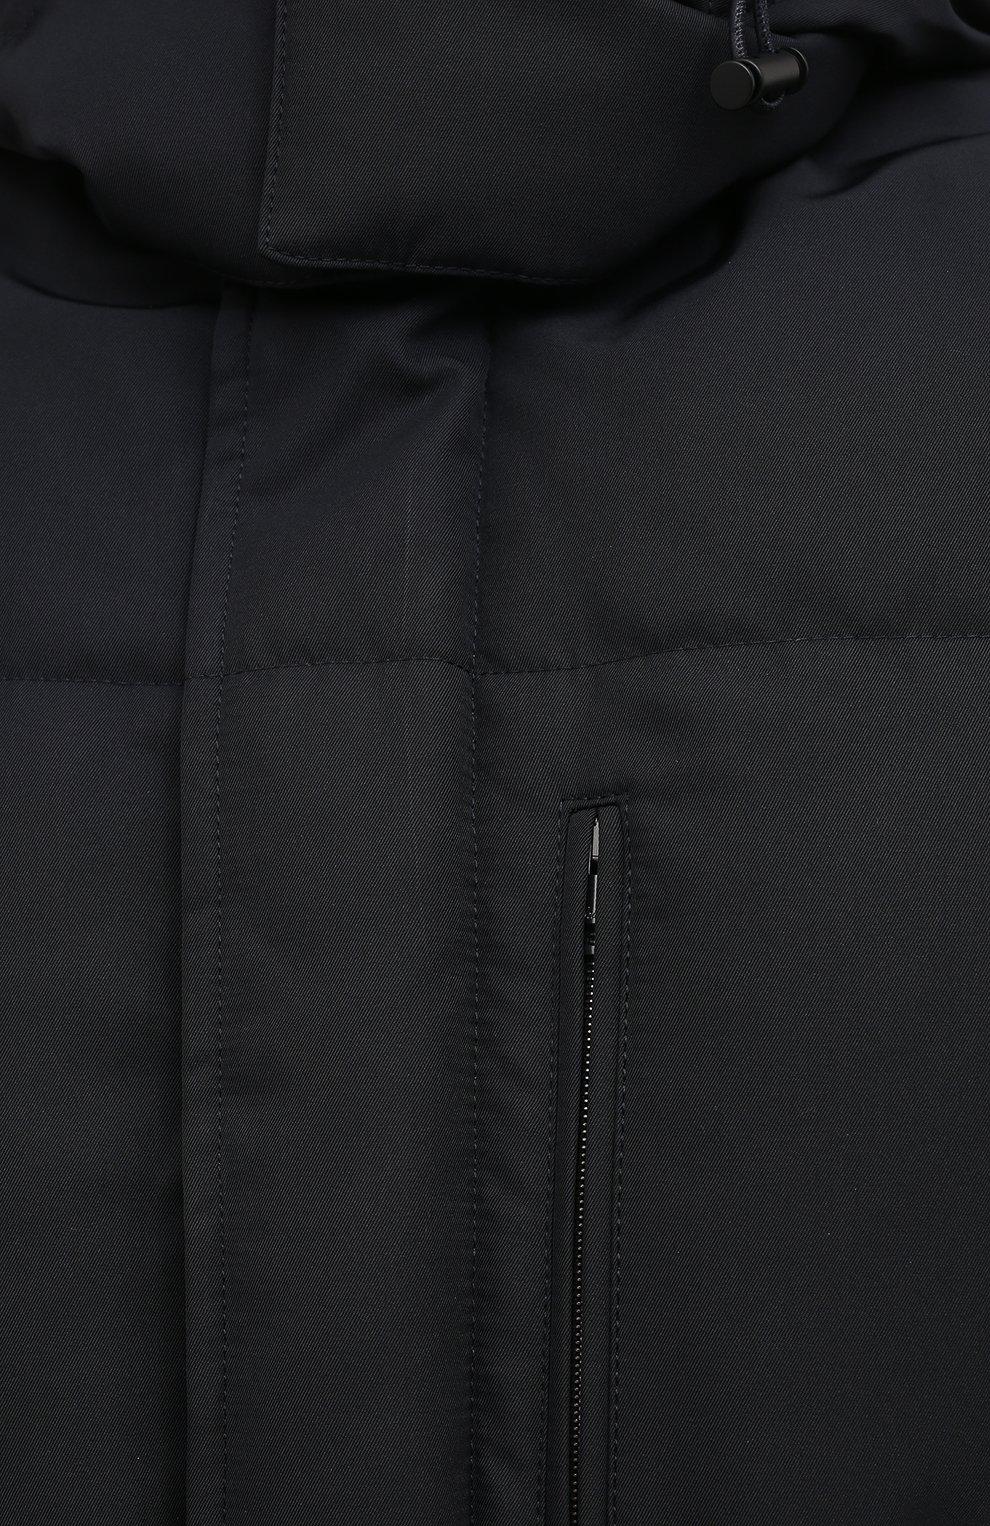 Мужская пуховик BRIONI темно-синего цвета, арт. SUNL0L/03811 | Фото 5 (Кросс-КТ: Куртка, Пуховик; Мужское Кросс-КТ: пуховик-короткий, Пуховик-верхняя одежда, Верхняя одежда; Рукава: Длинные; Длина (верхняя одежда): До середины бедра; Материал внешний: Синтетический материал; Материал подклада: Синтетический материал; Материал утеплителя: Пух и перо; Стили: Кэжуэл)